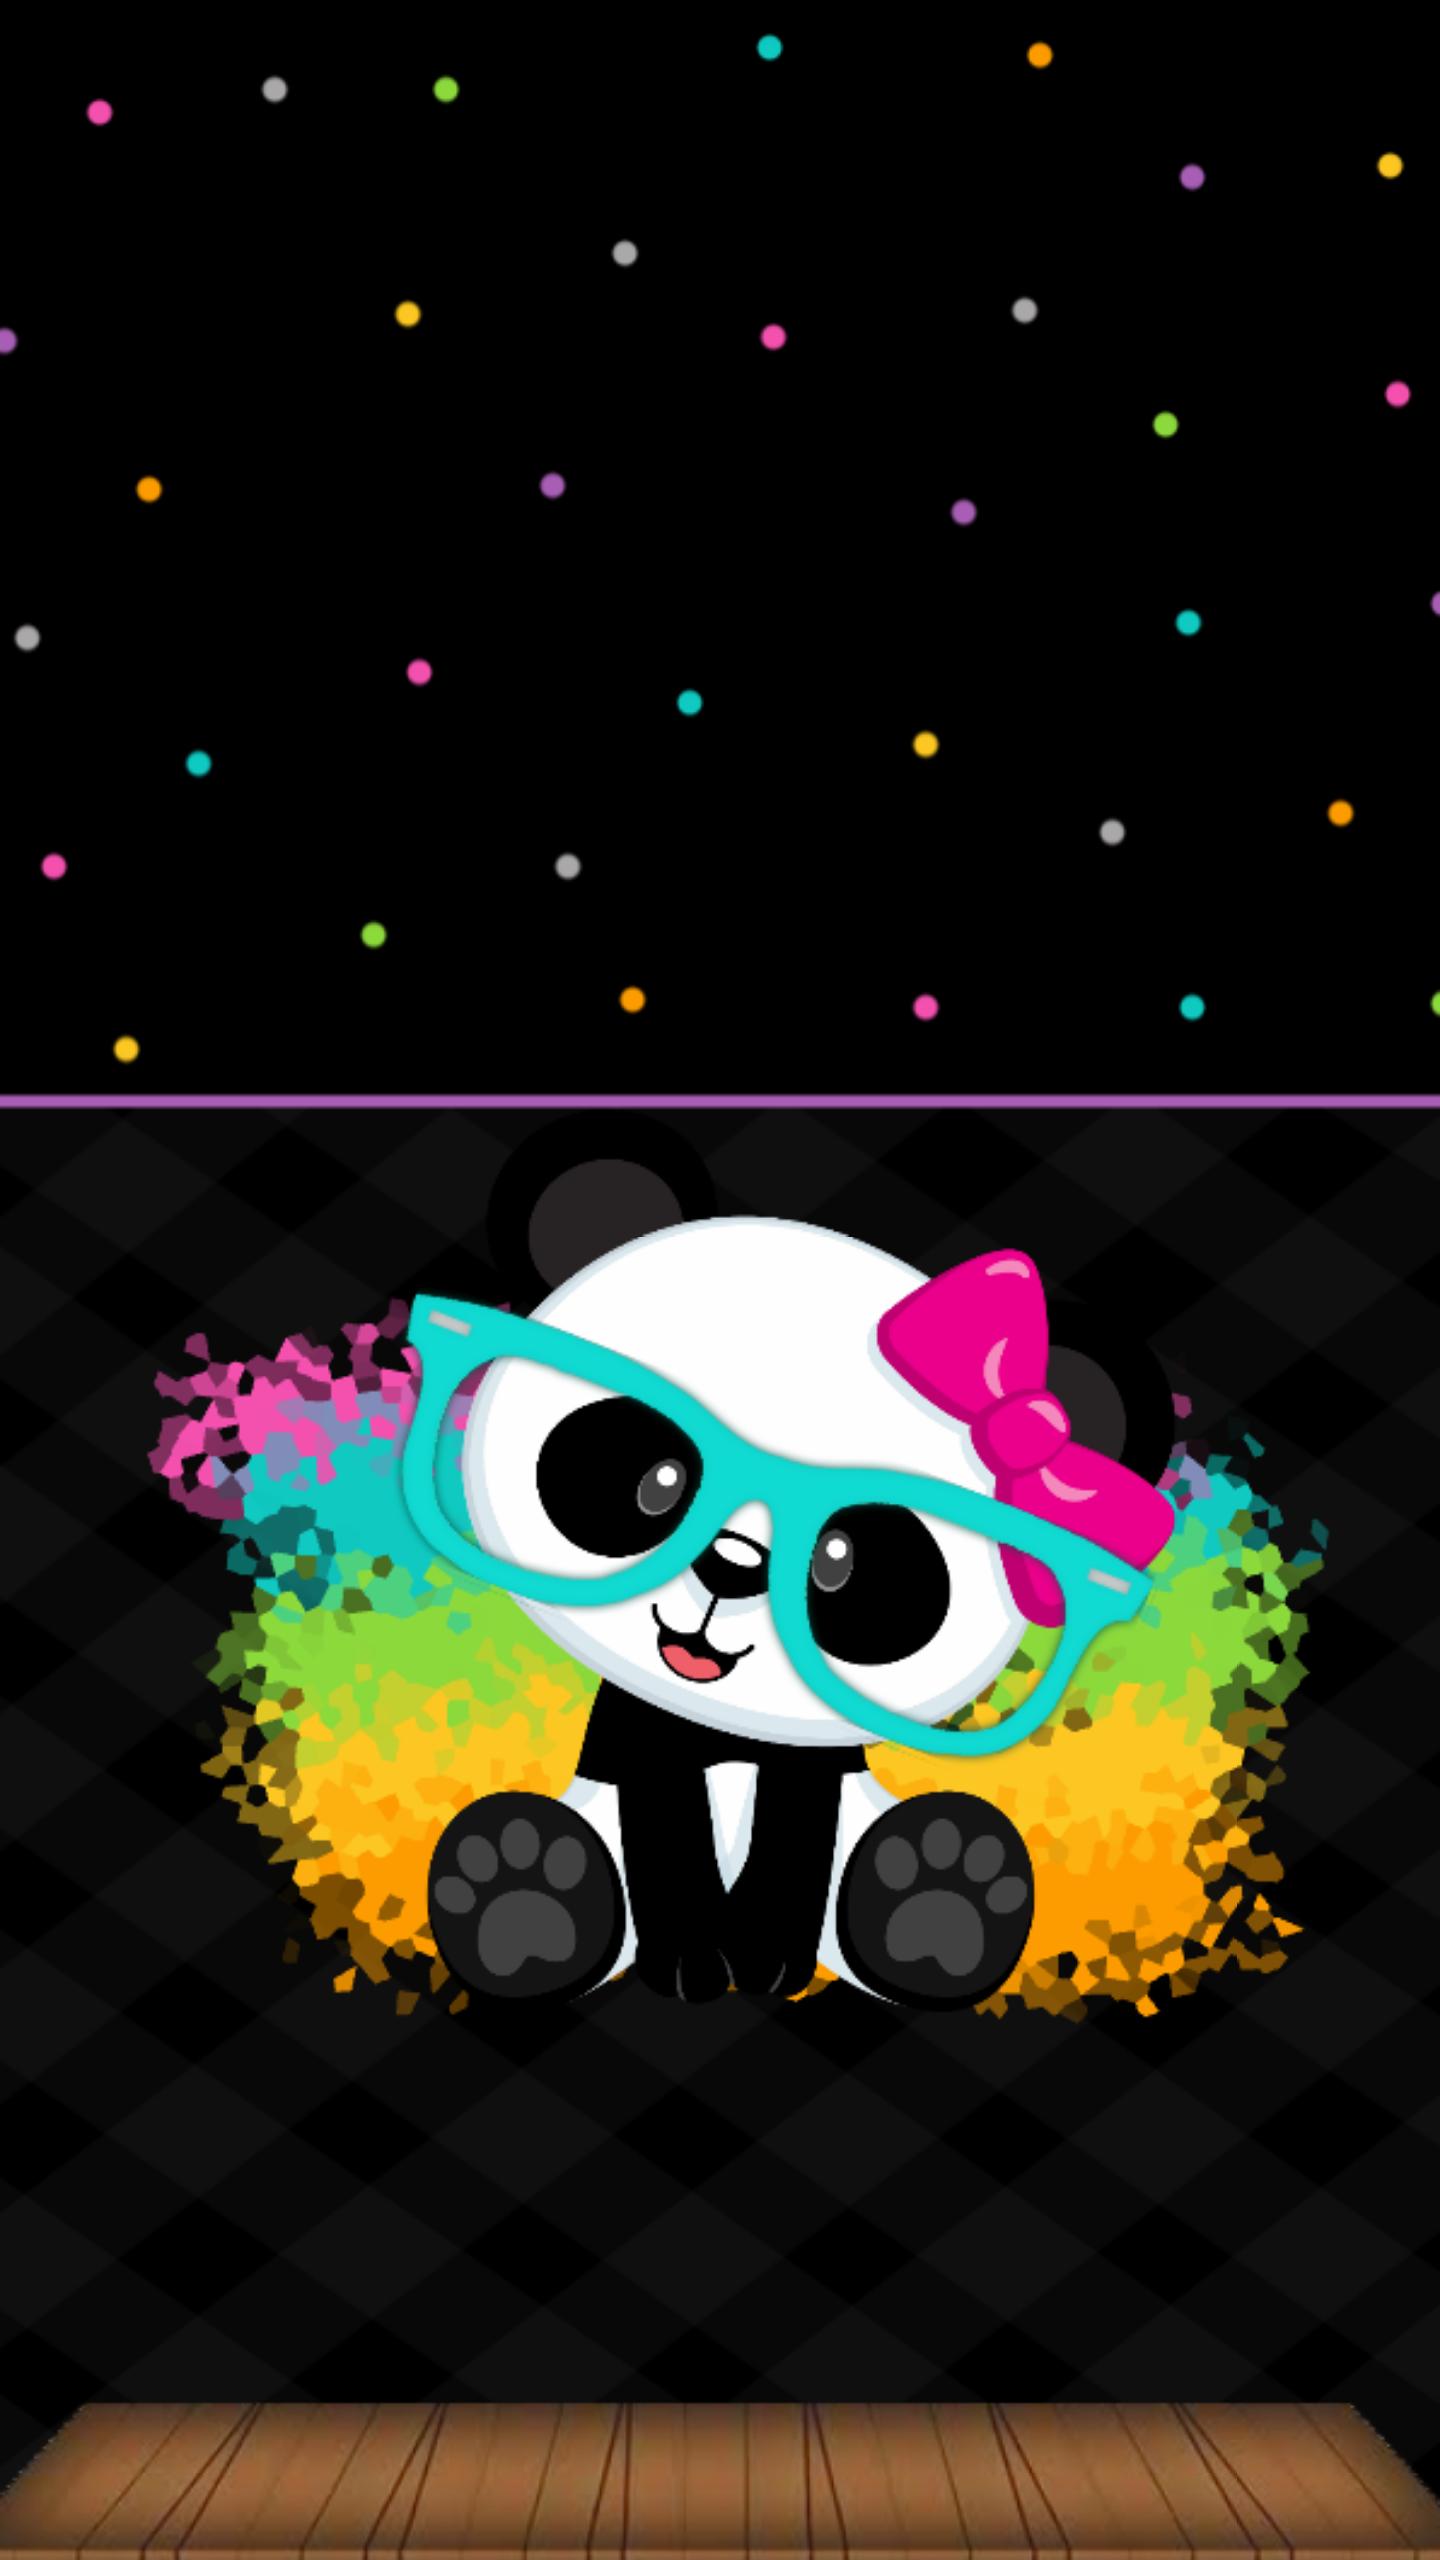 Great Wallpaper Hello Kitty Panda - e10d1b7b96412e8afb3ef1c07ebfbec5  Trends_75184.jpg